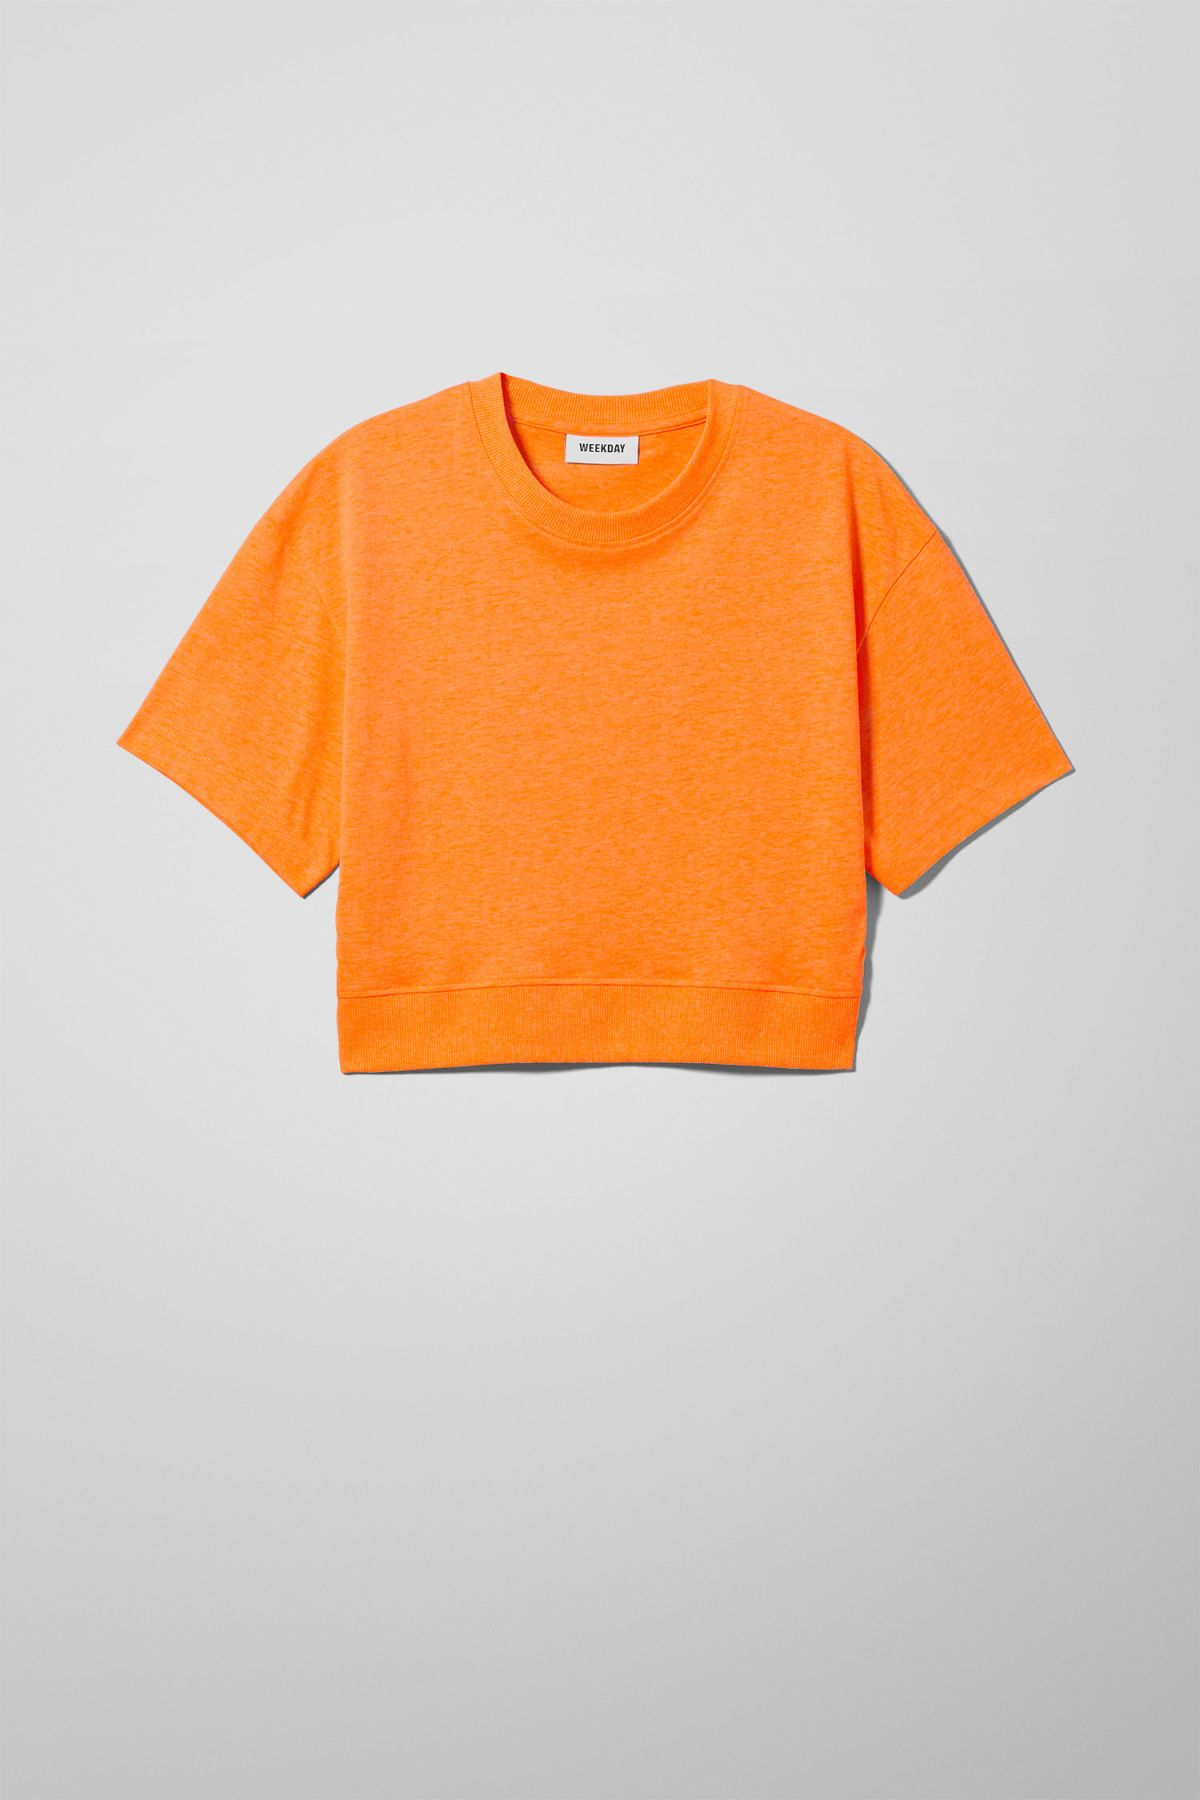 Pin By Kiran Rawat On 3 For 999 Clothing T Shirt Crop Top